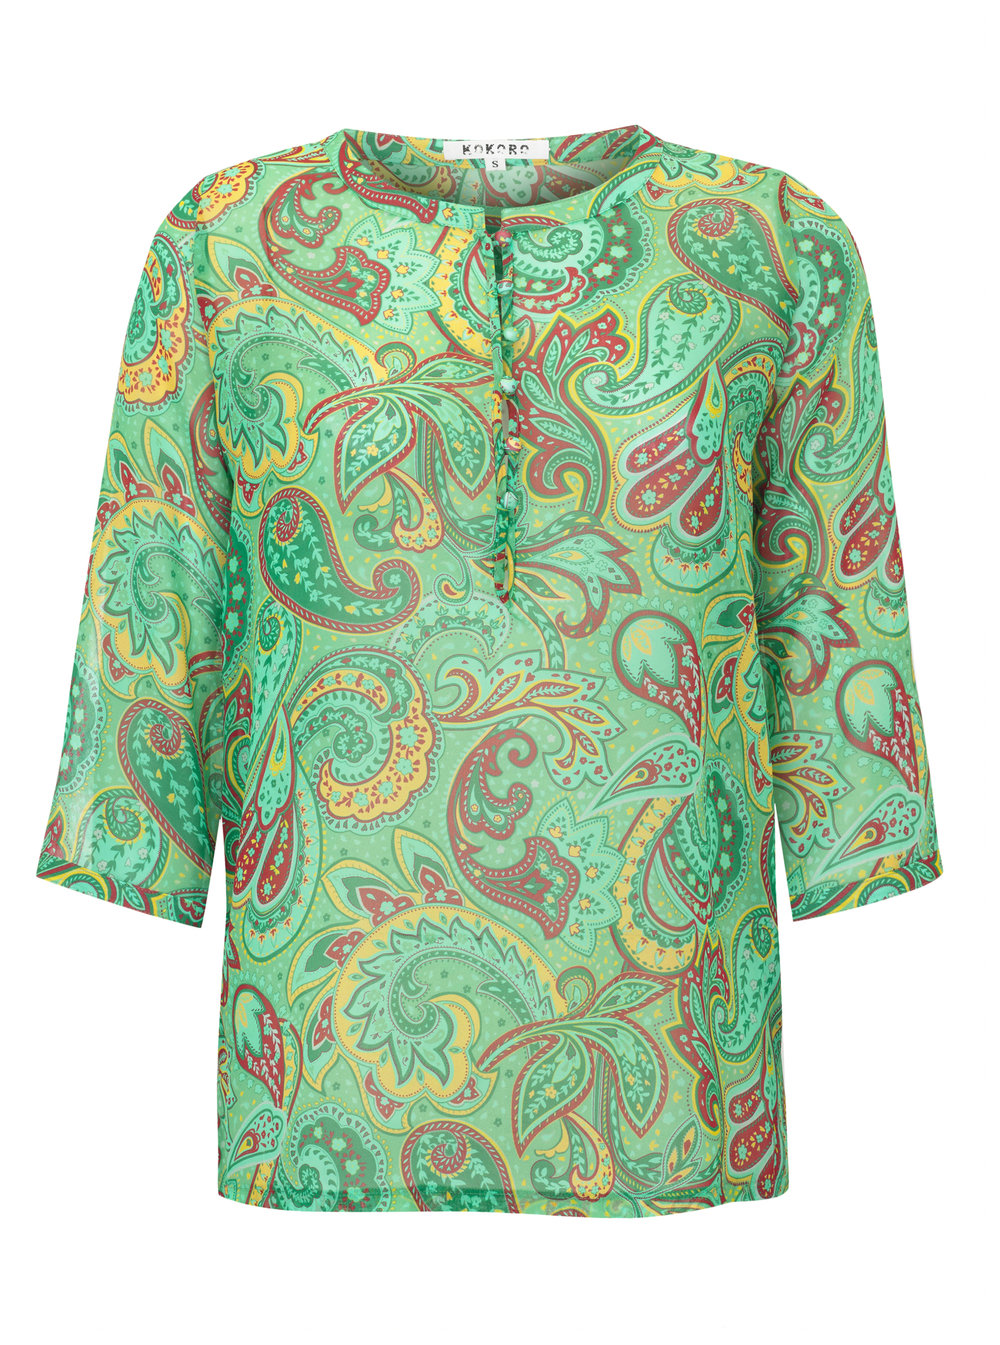 Paisley-jade-Shirt-Kokoro-BellaGomez.jpg